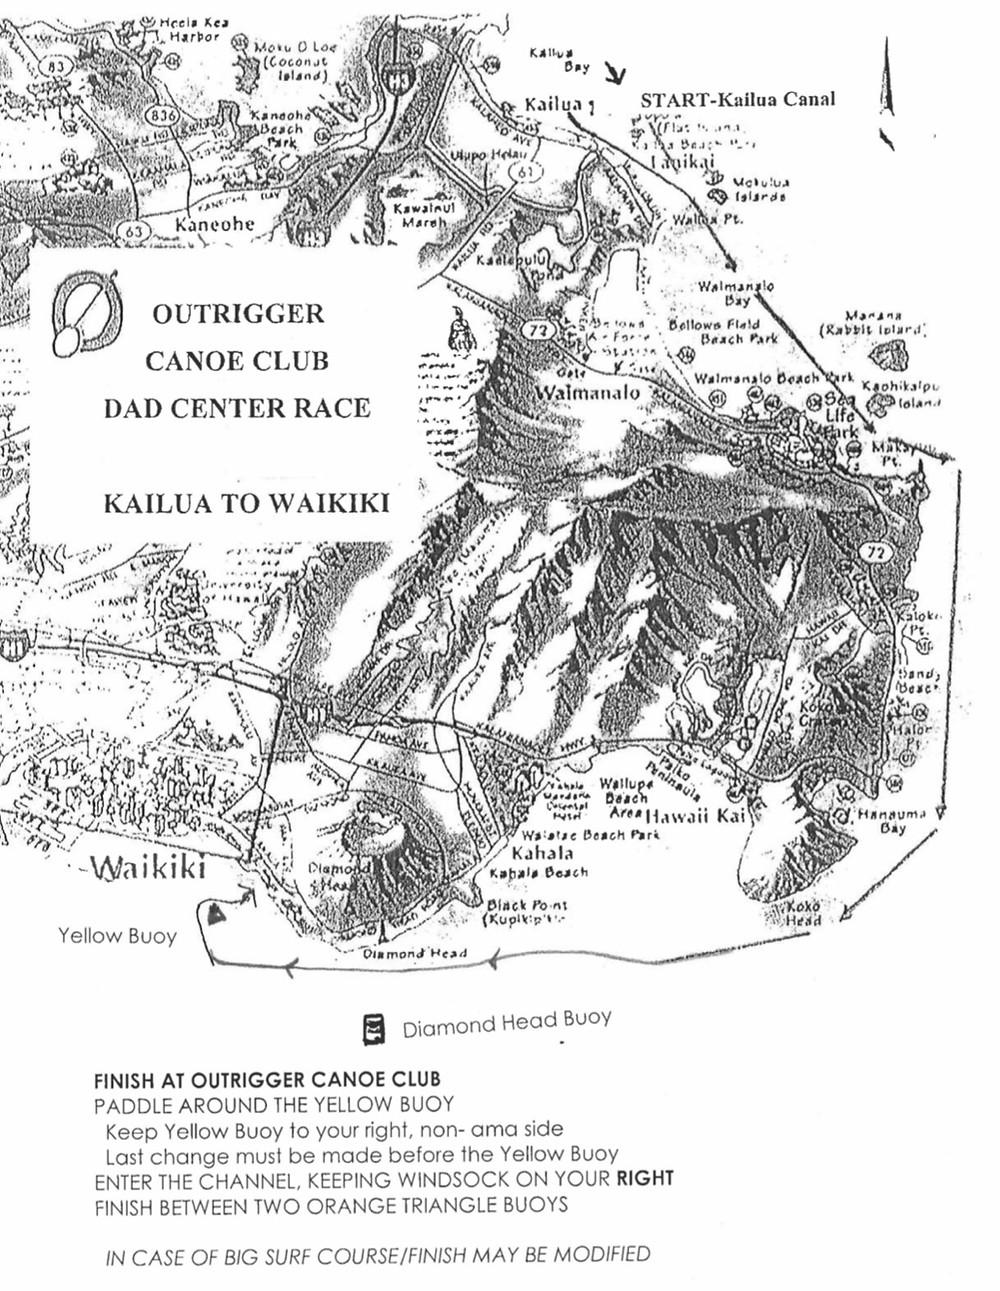 Outrigger Canoe Club - DAD Center Race - Kailua to Waikiki Map